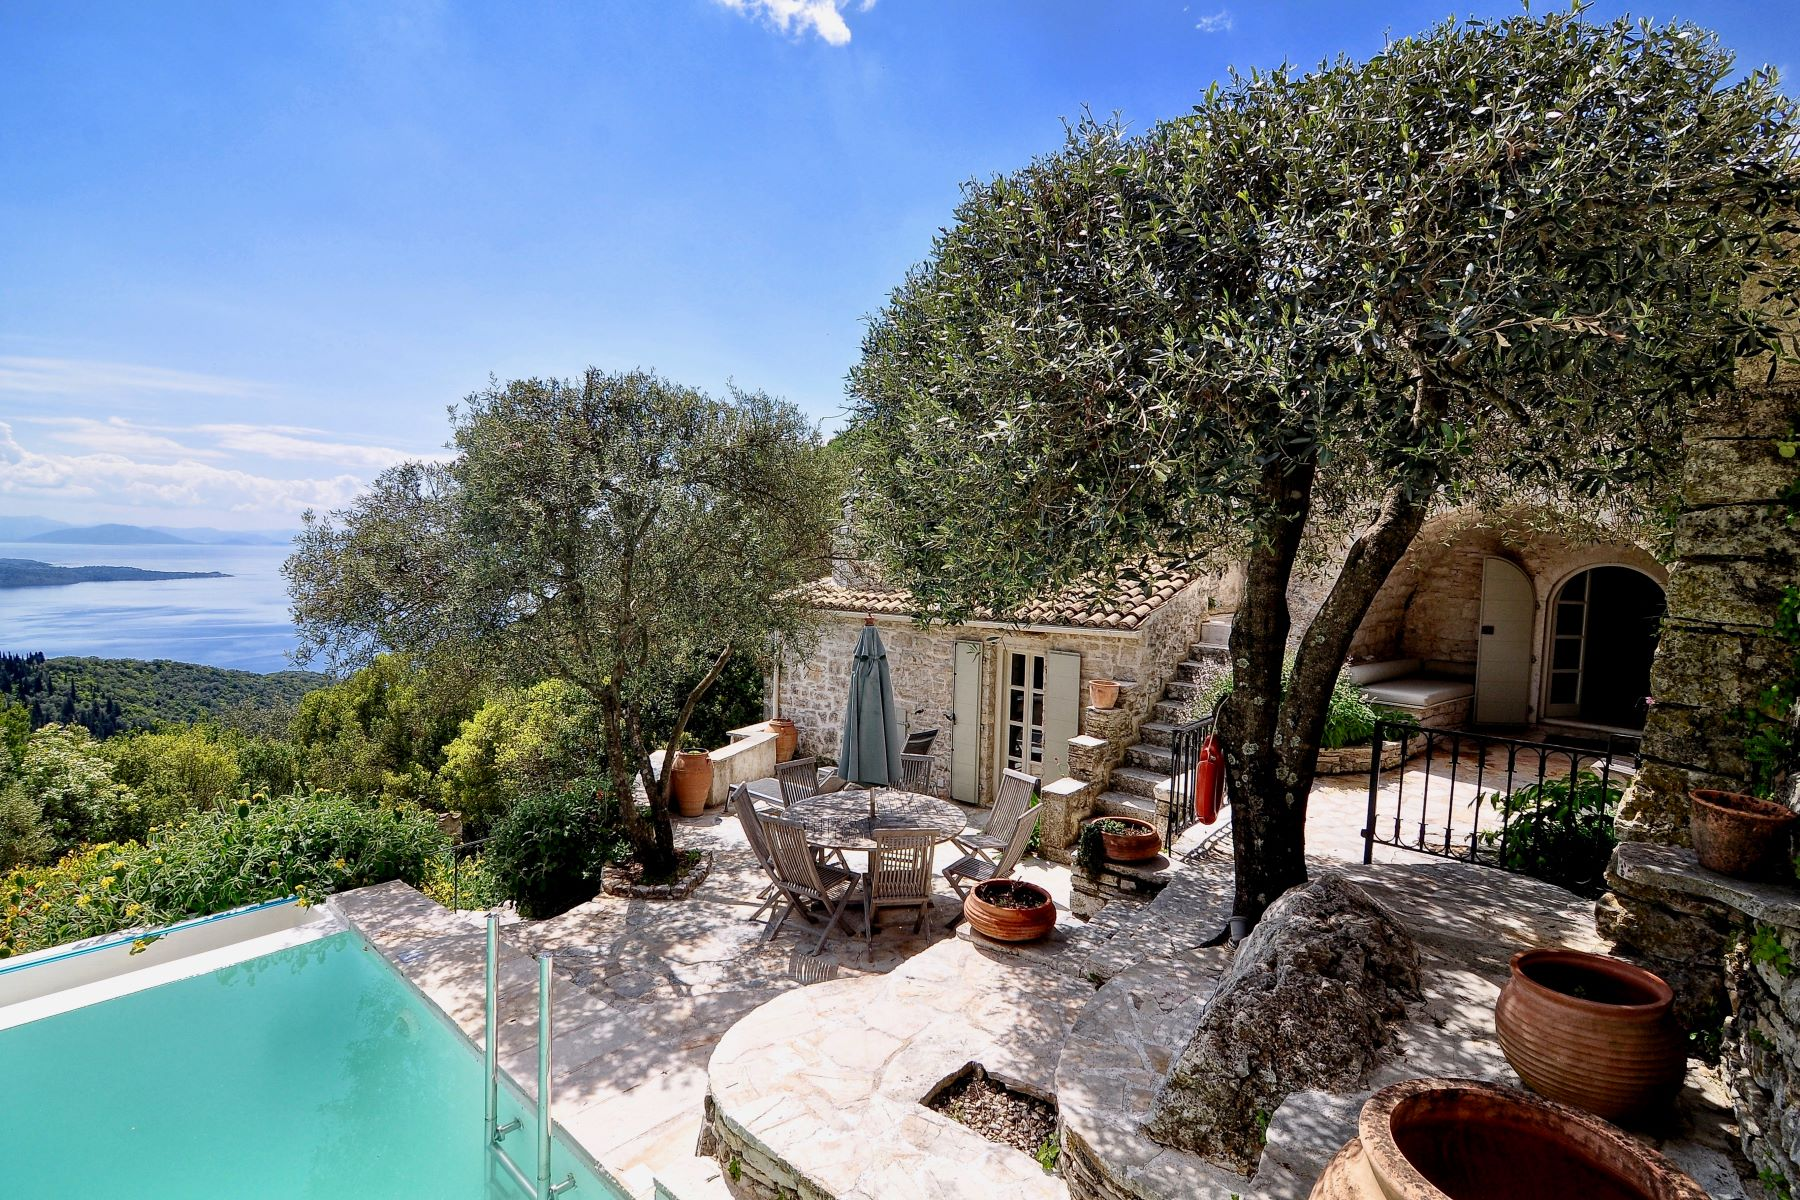 Single Family Home for Sale at Anemelia Corfu, Ionian Islands, Greece